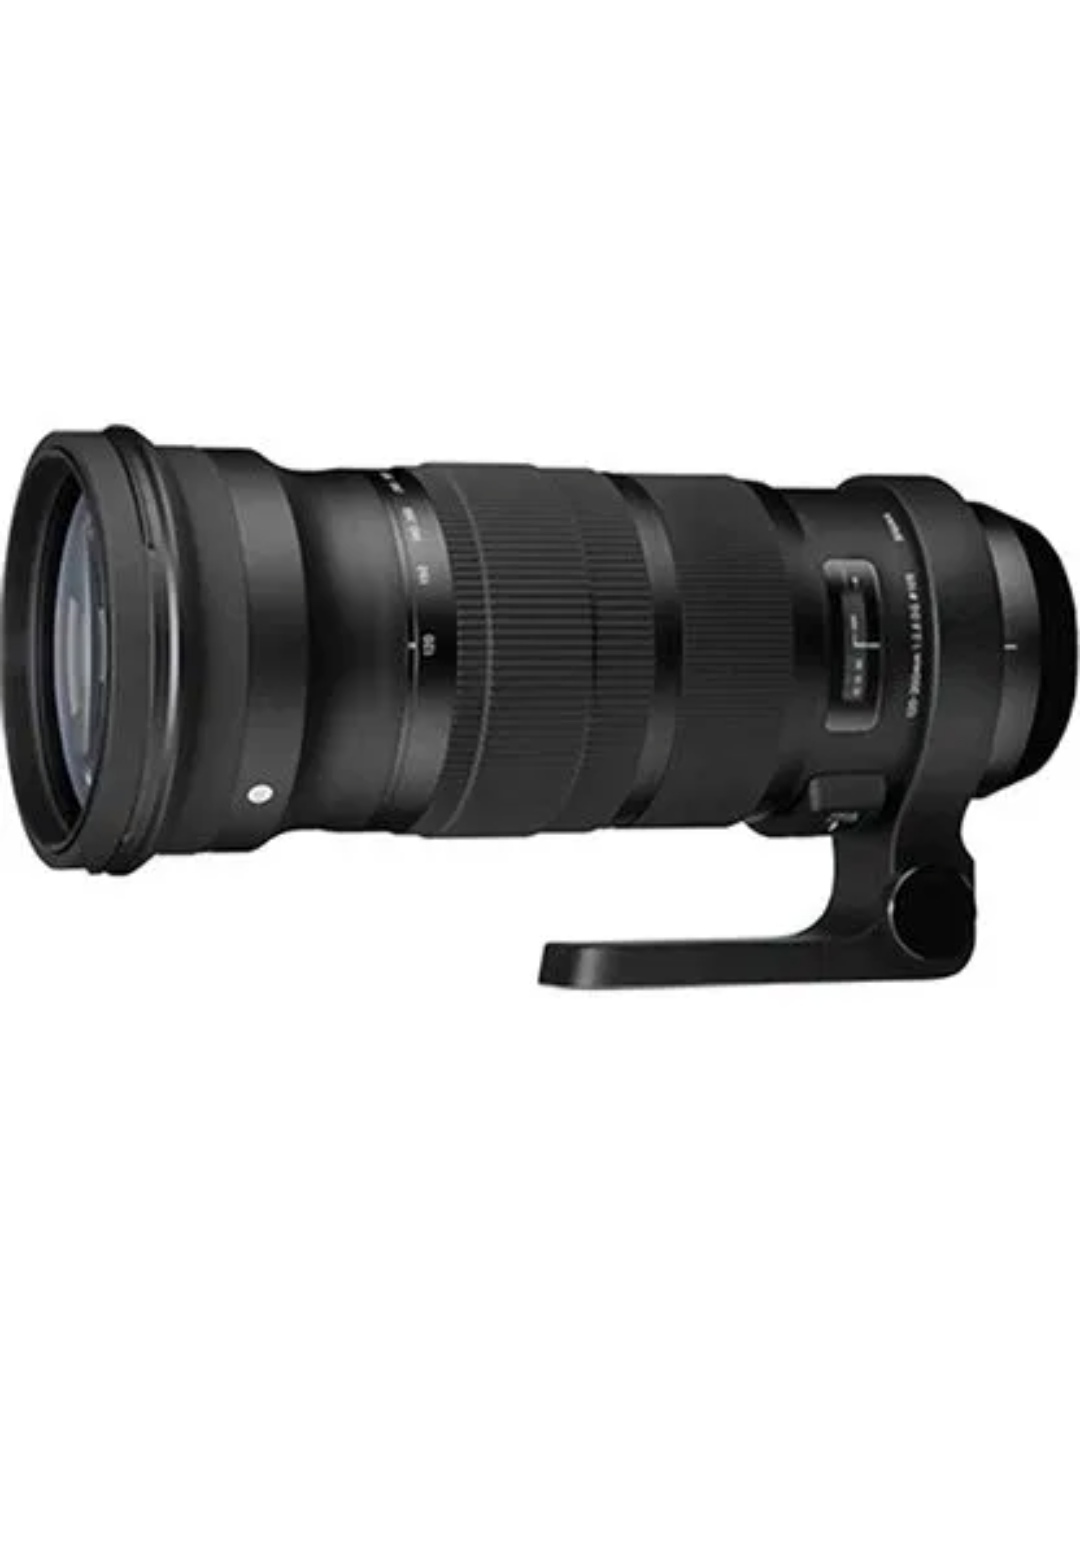 Sigma 120-300 F2.8 Lens Bargain !